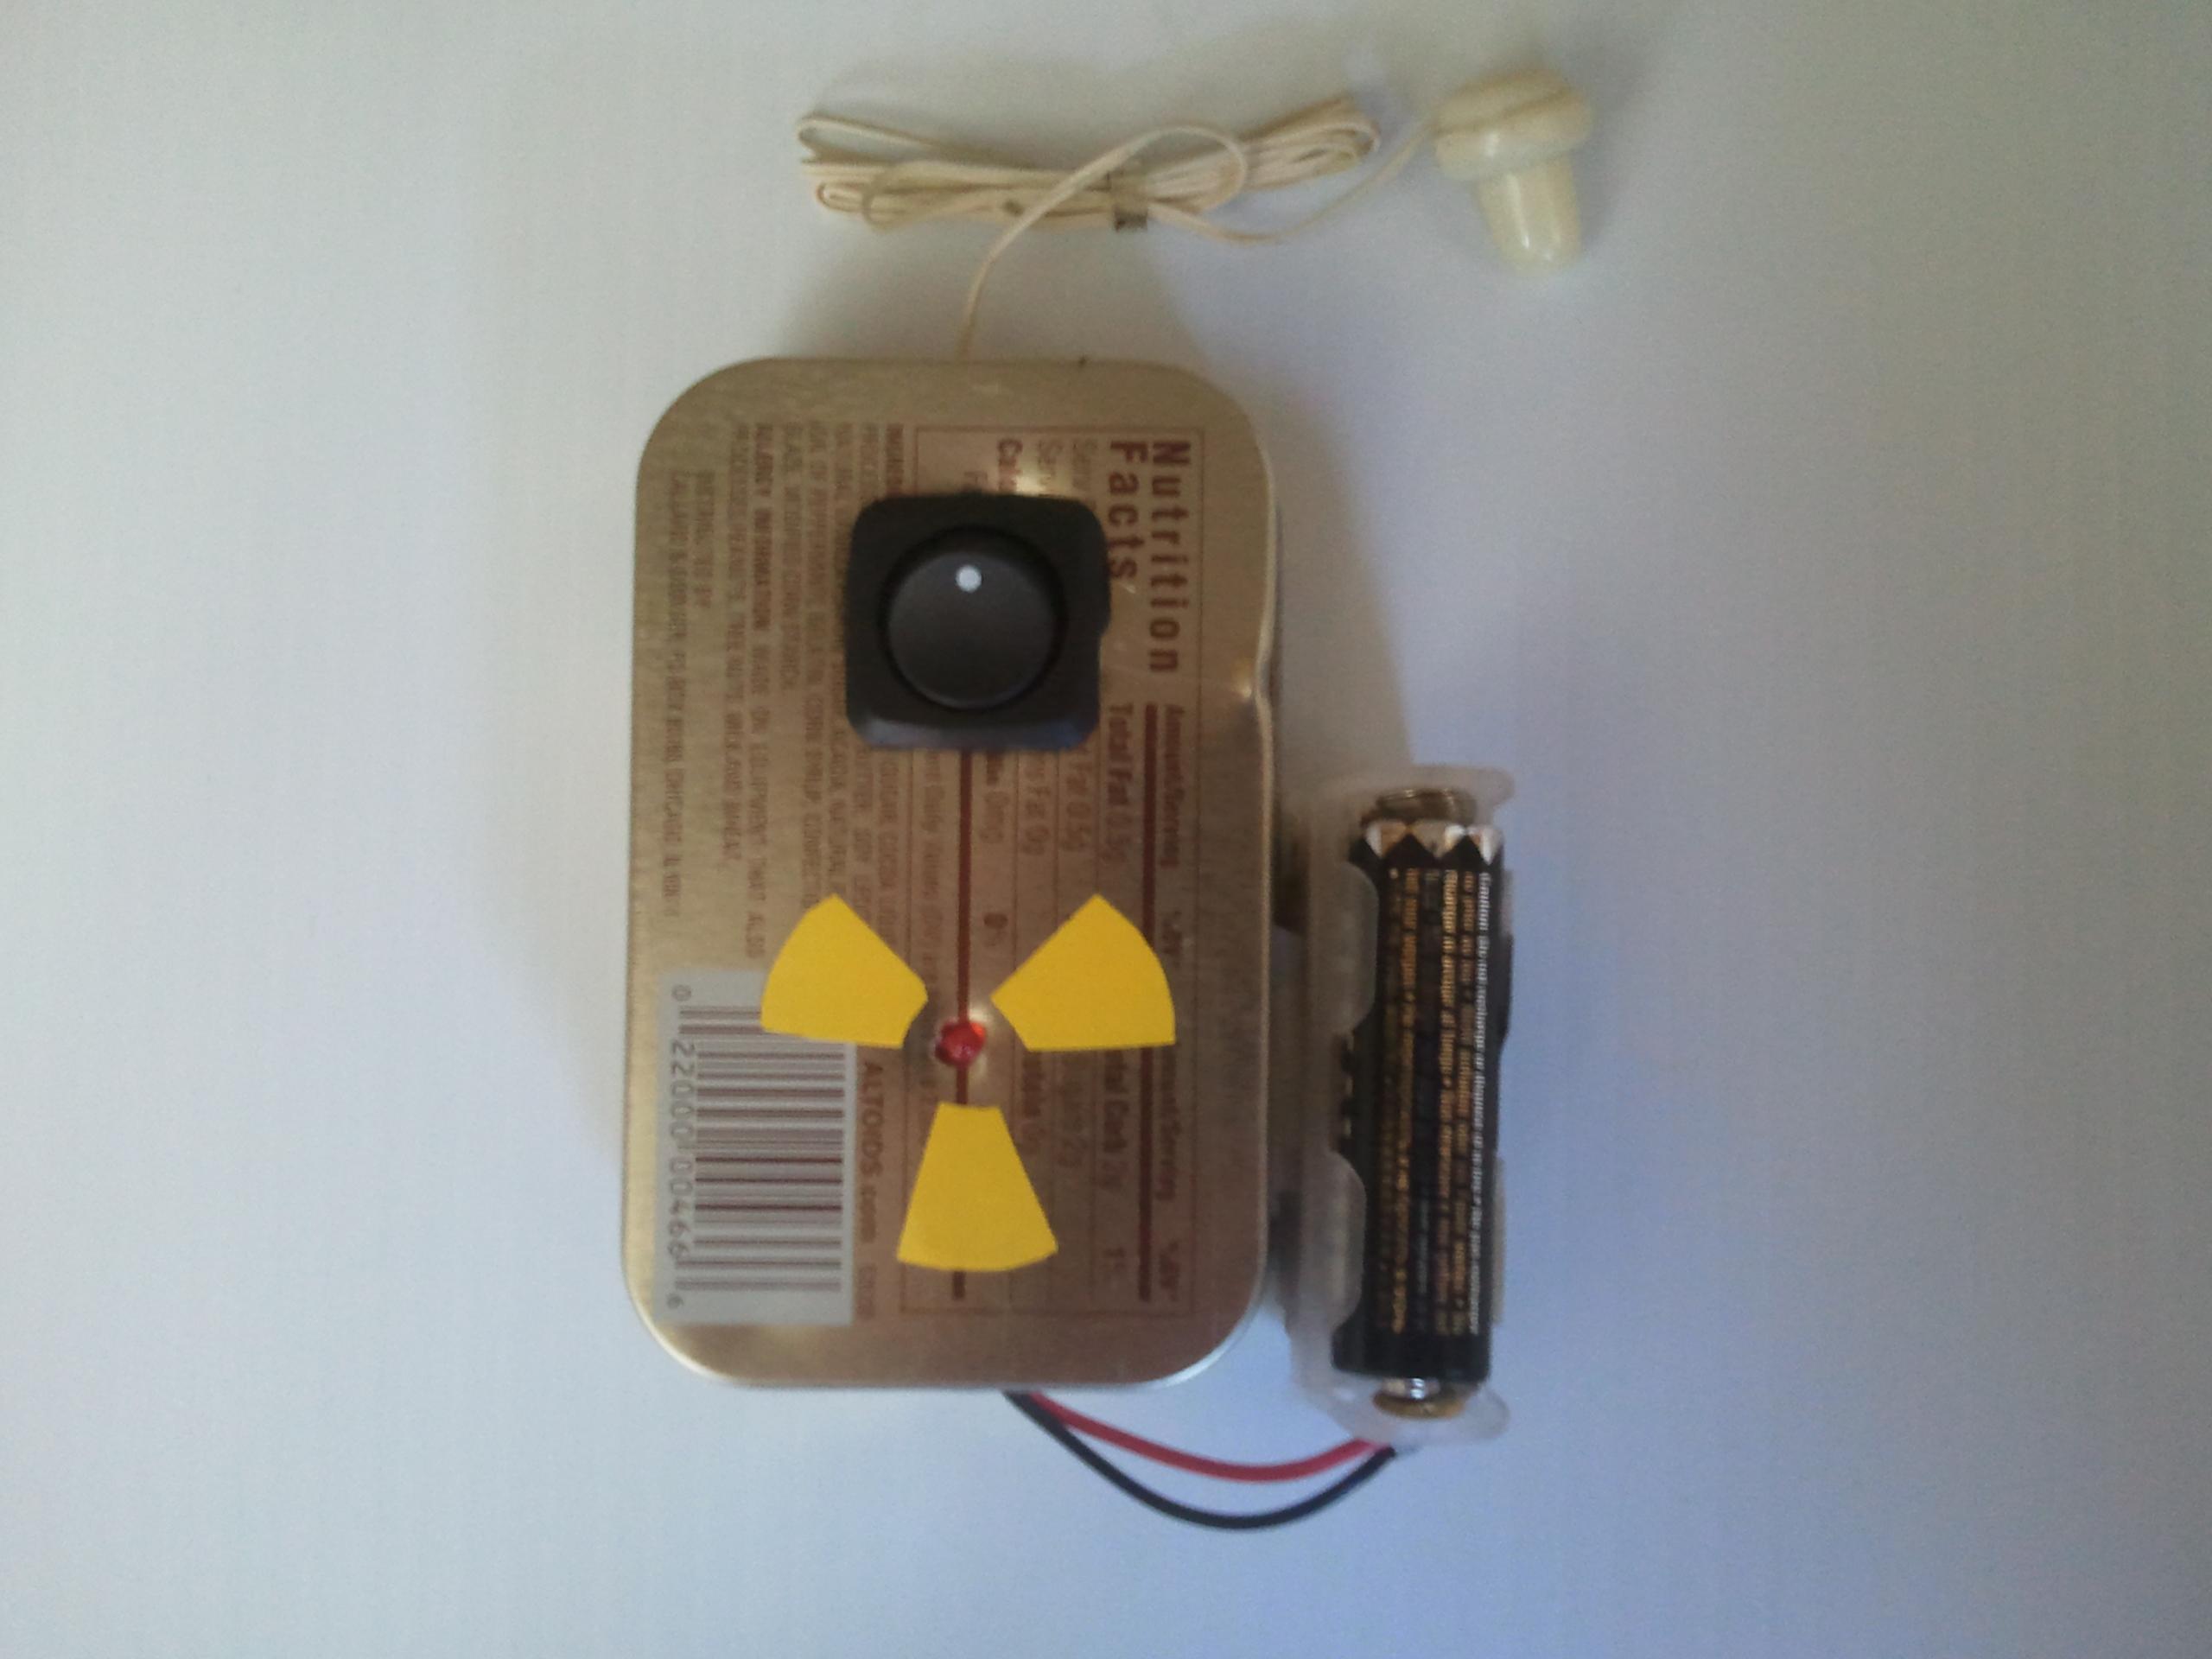 Build a Pocket Ionizing Radiation Detector (PIRD)